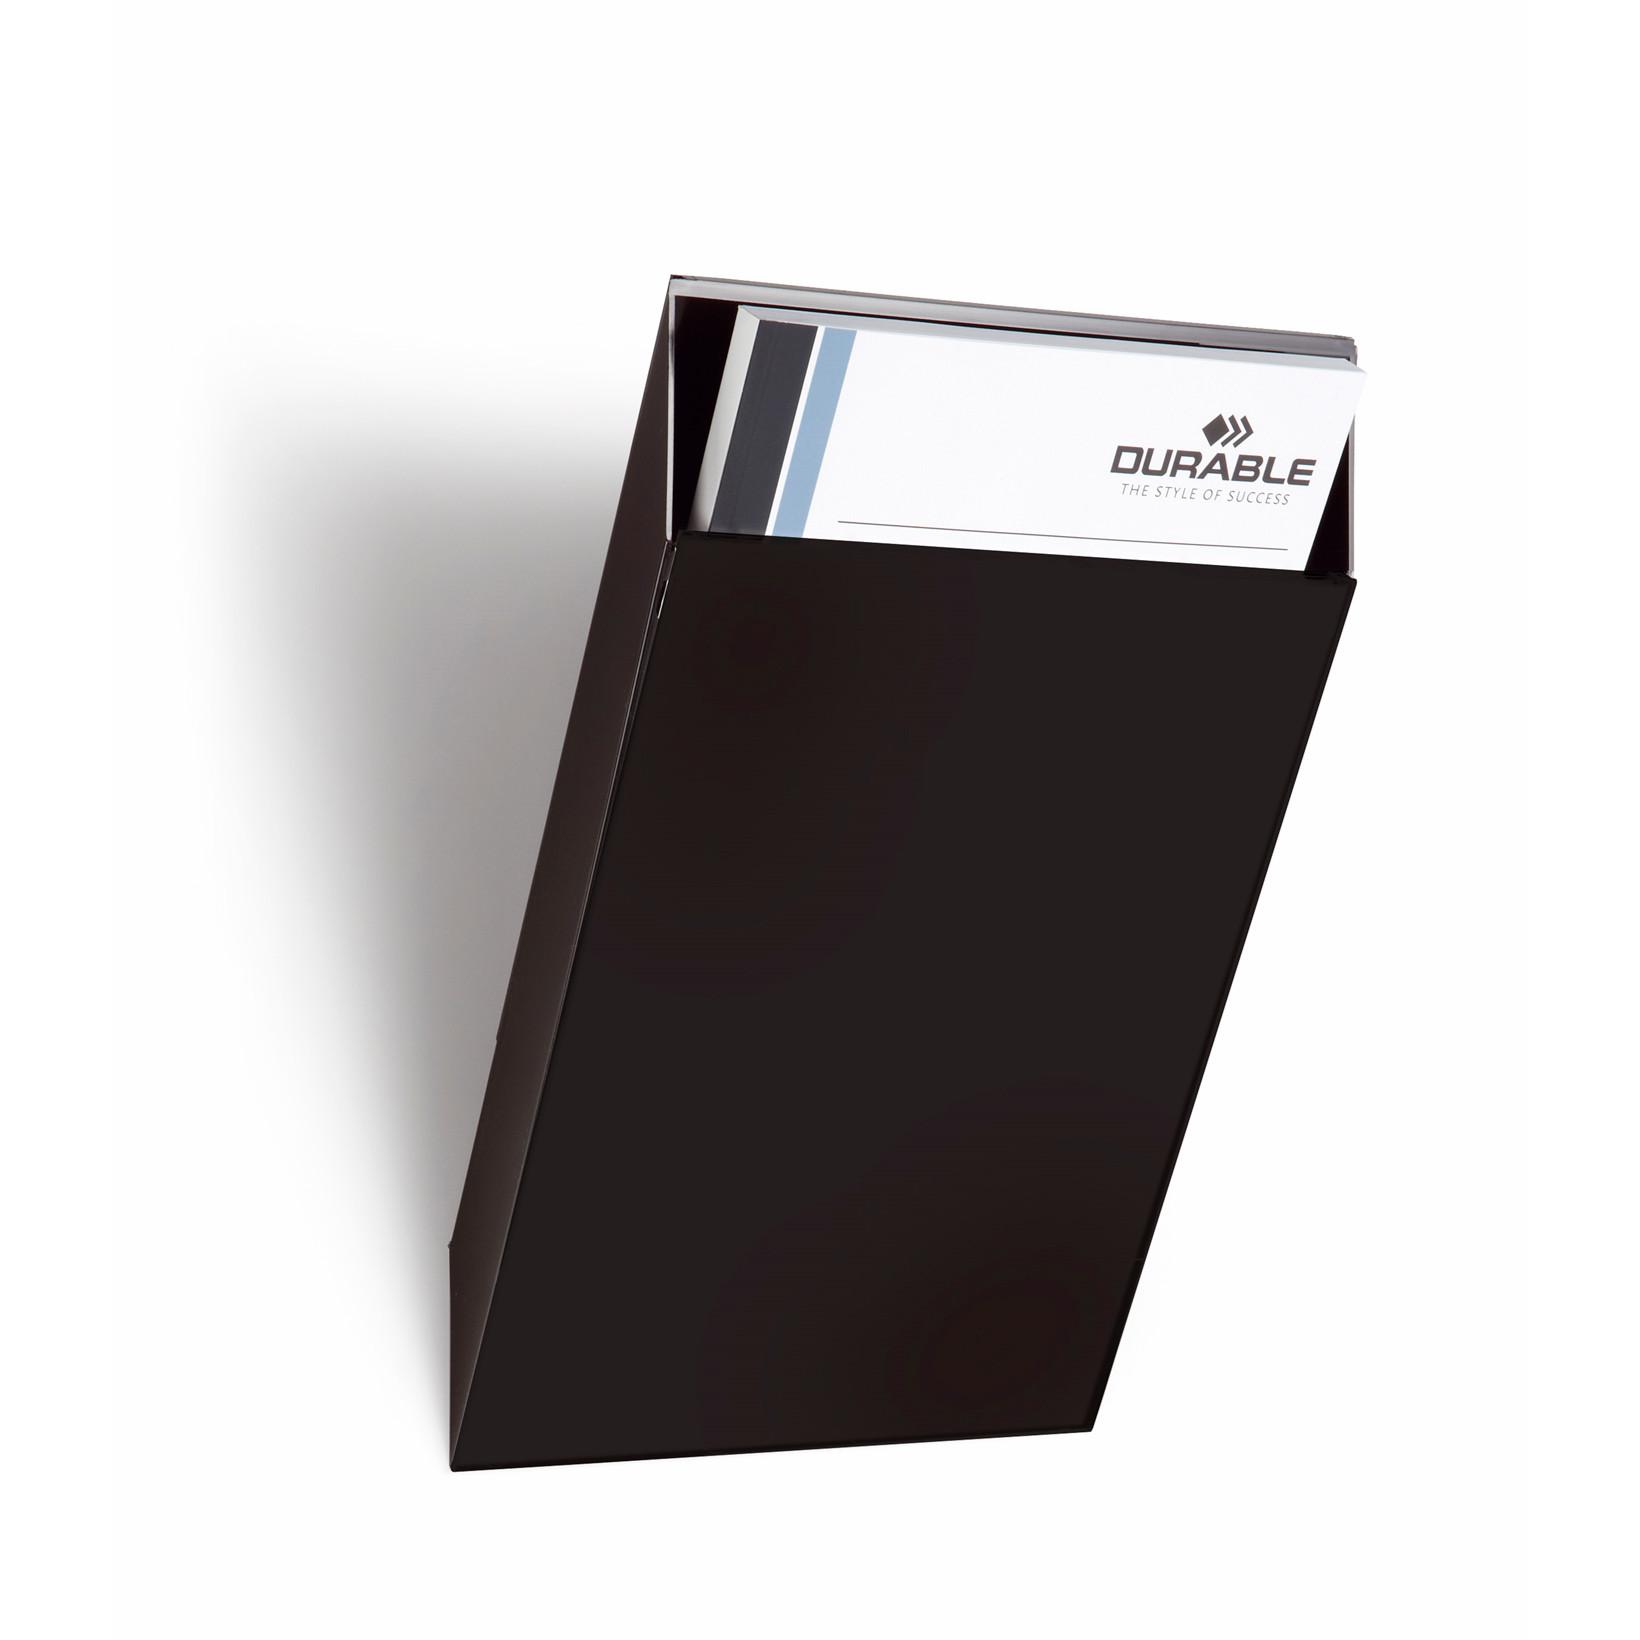 Bakke udvidelse til Flexiboxx A4 Brochureholder - 1 sort stående